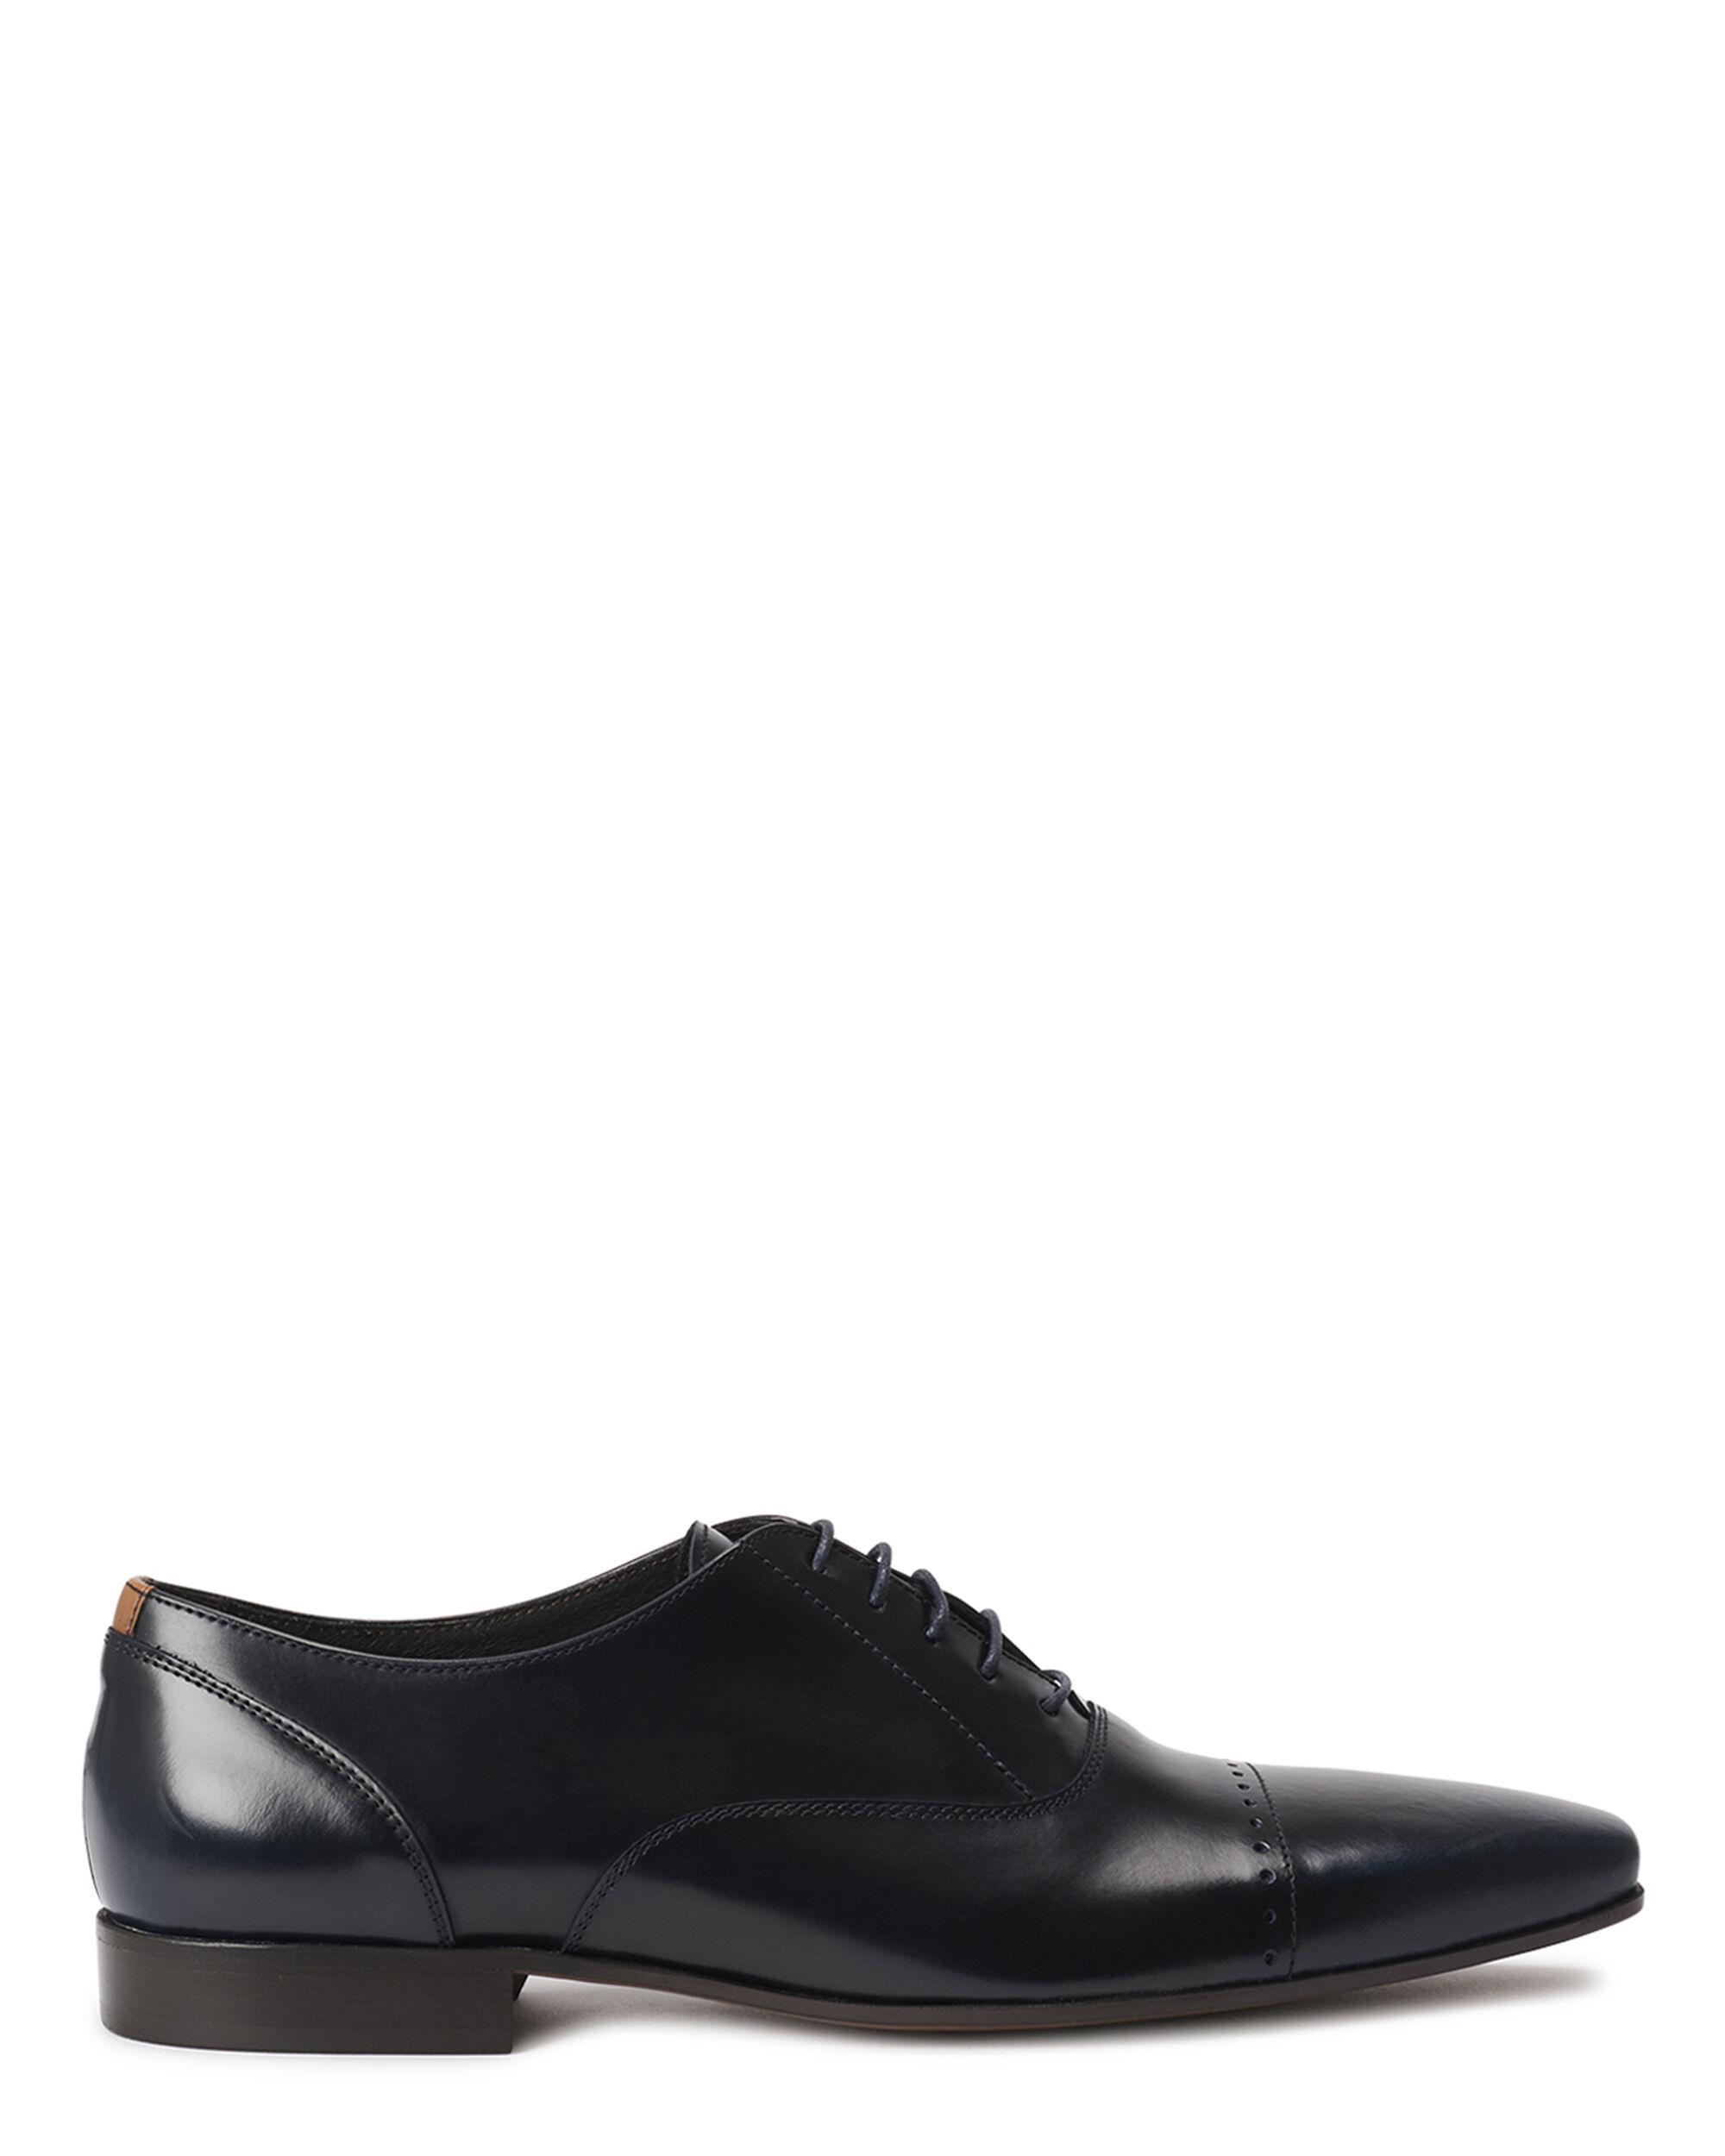 Chaussures Richelieu Veau Cuir Chefin eCBdrxo